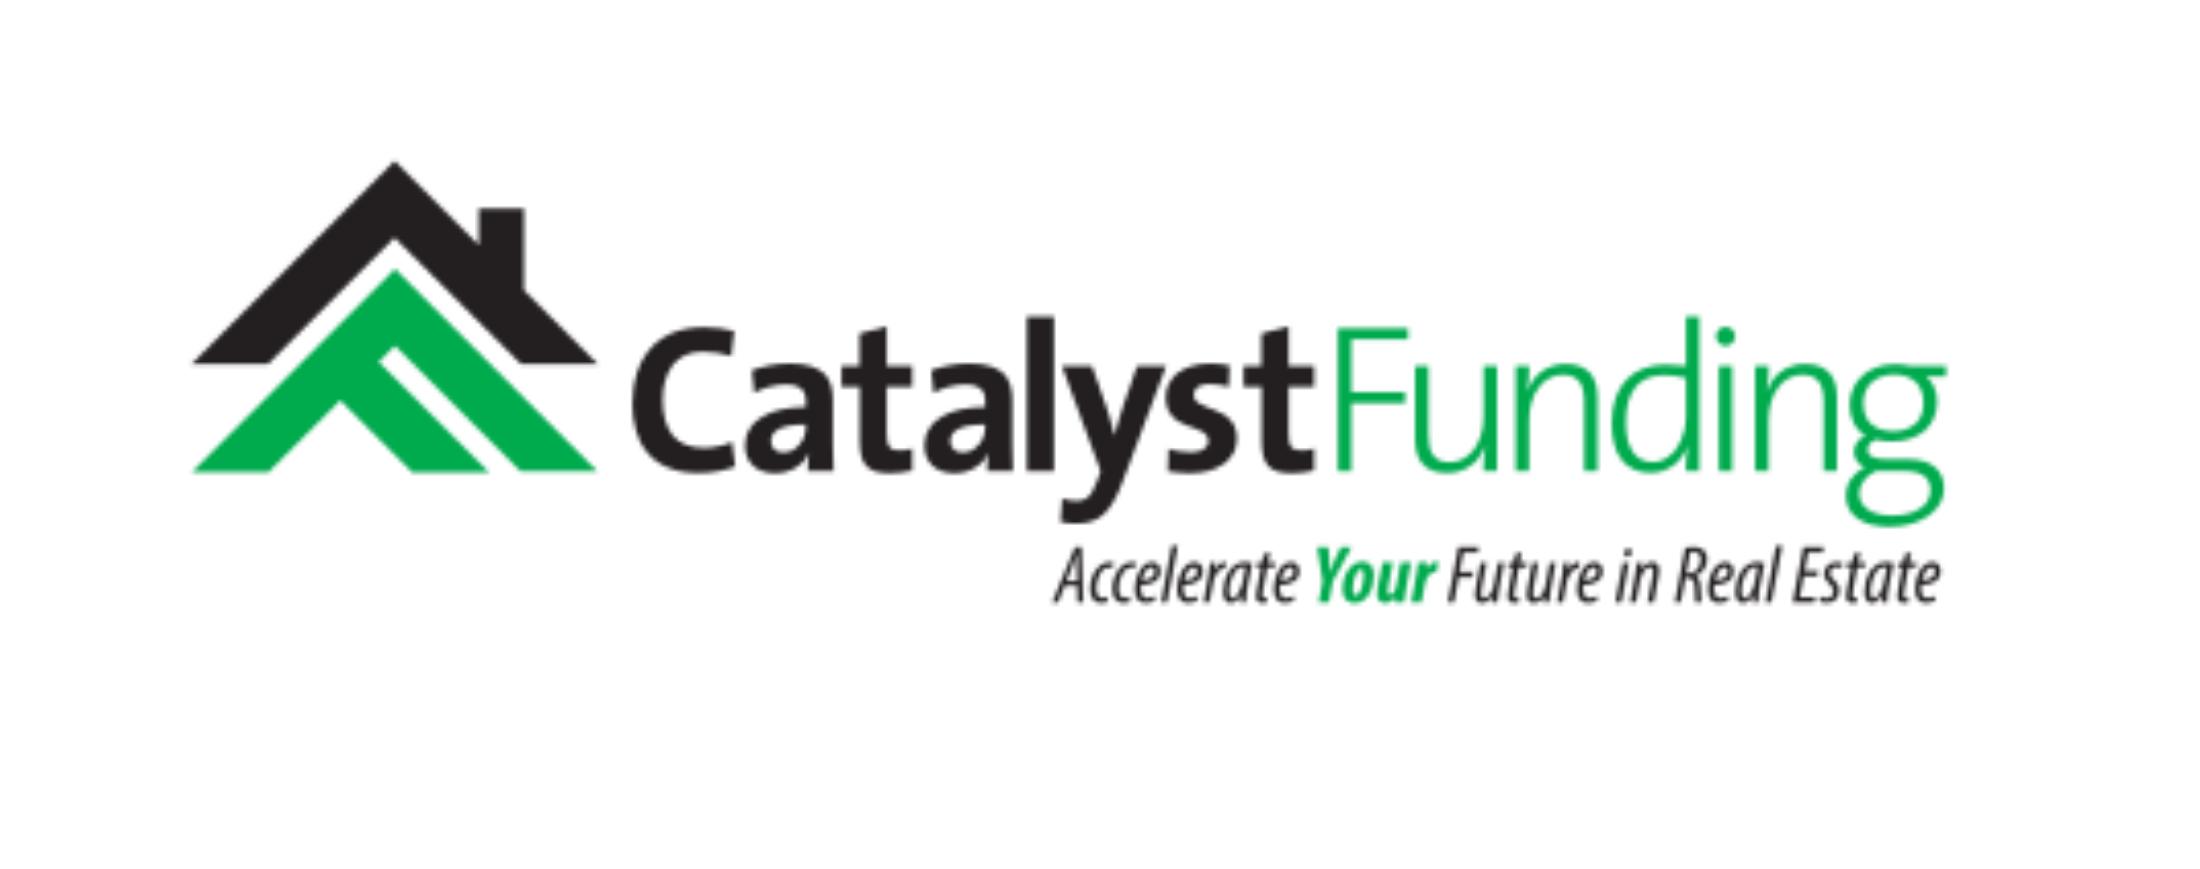 Catalyst Funding